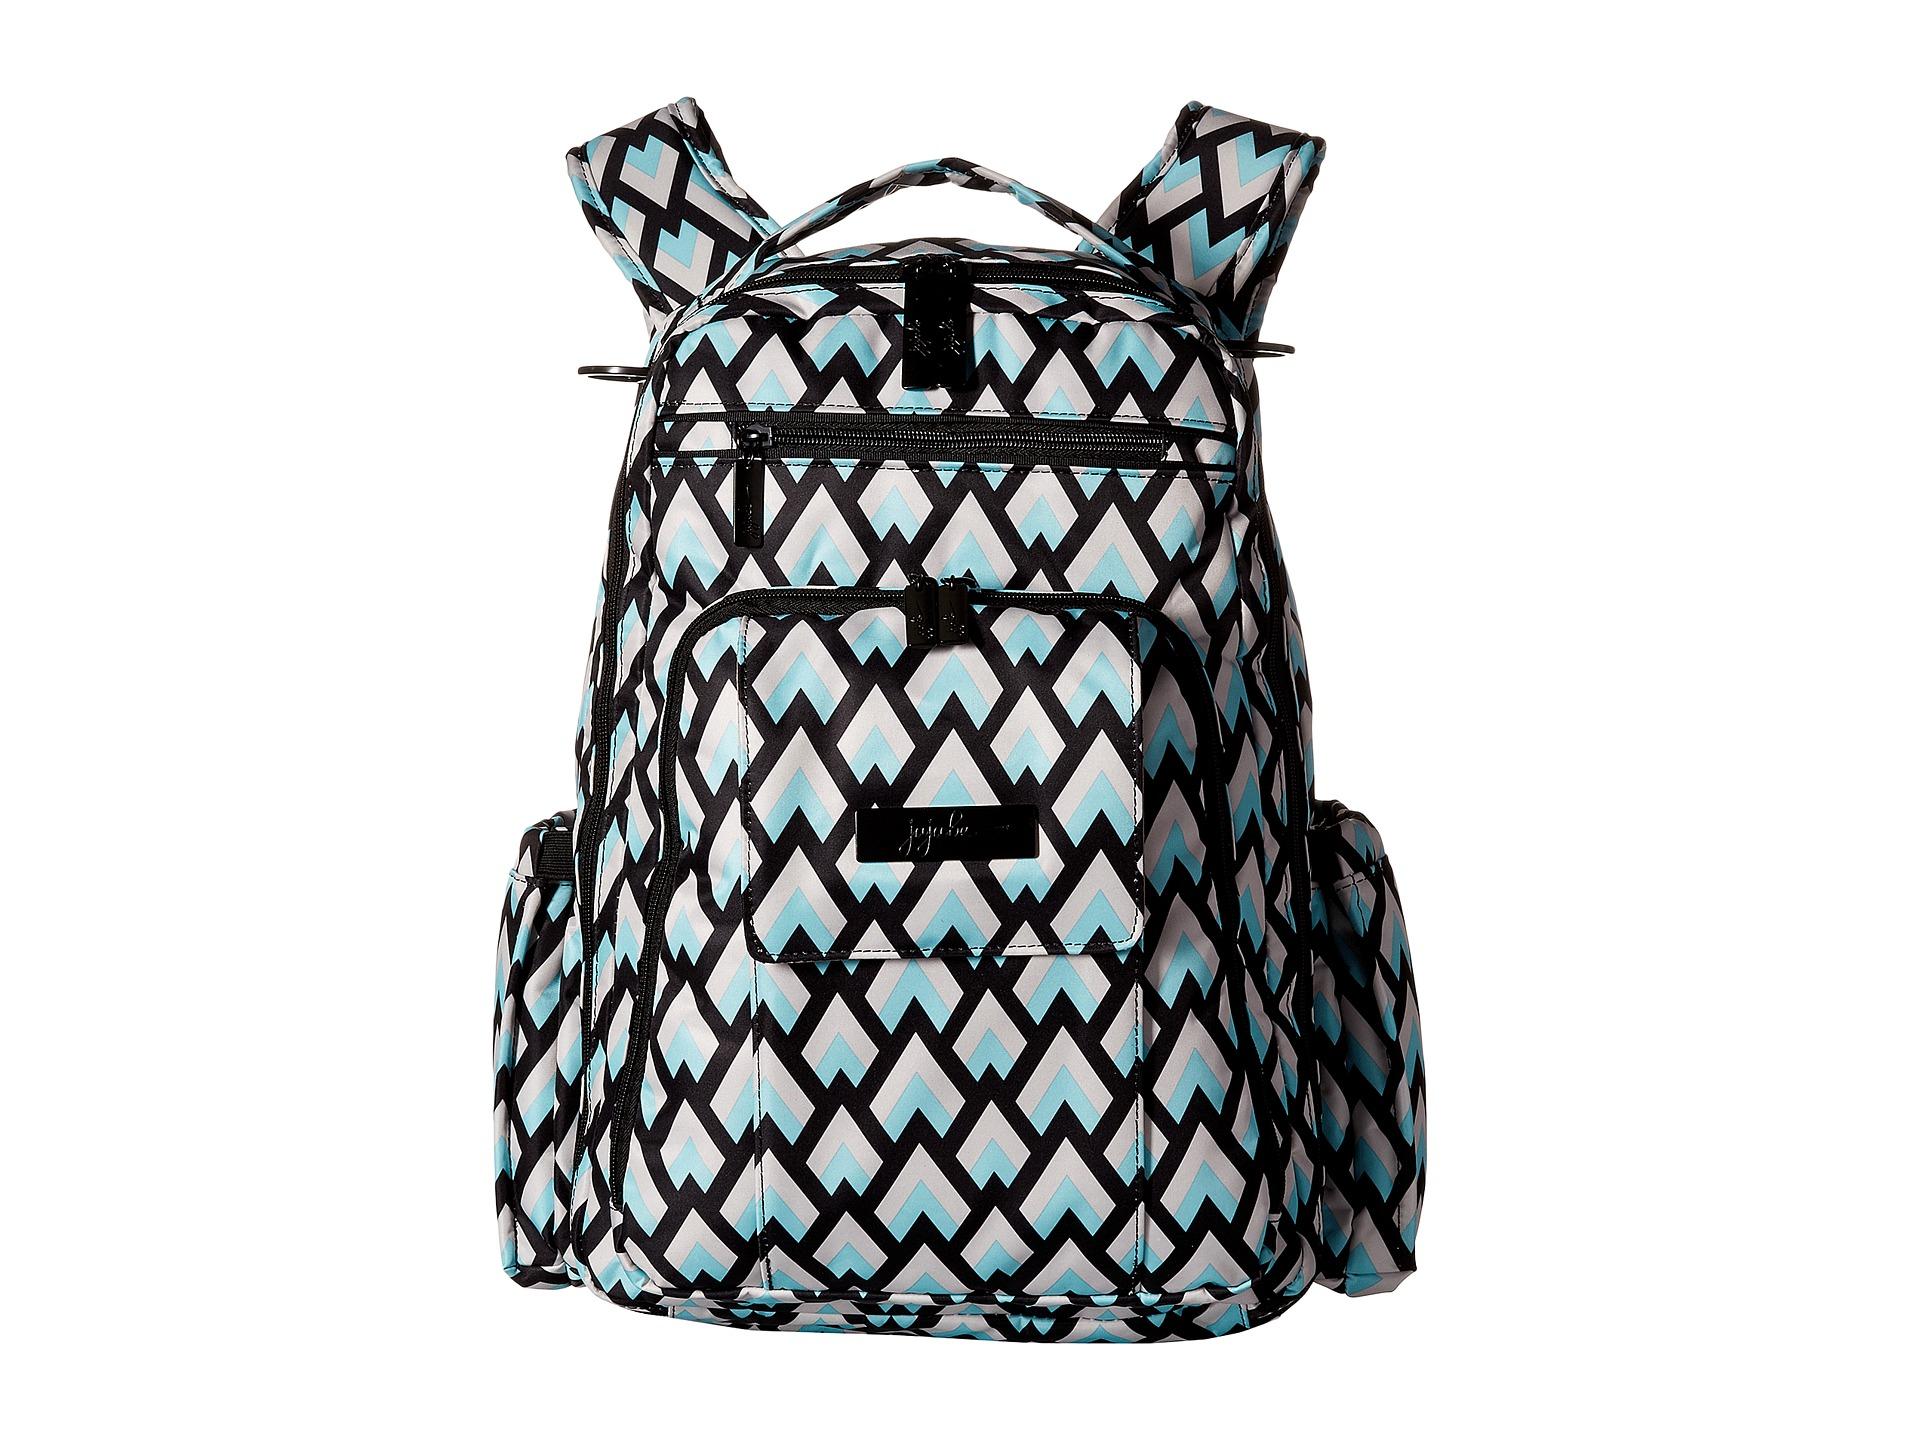 ju ju be onyx collection be right back backpack diaper bag. Black Bedroom Furniture Sets. Home Design Ideas